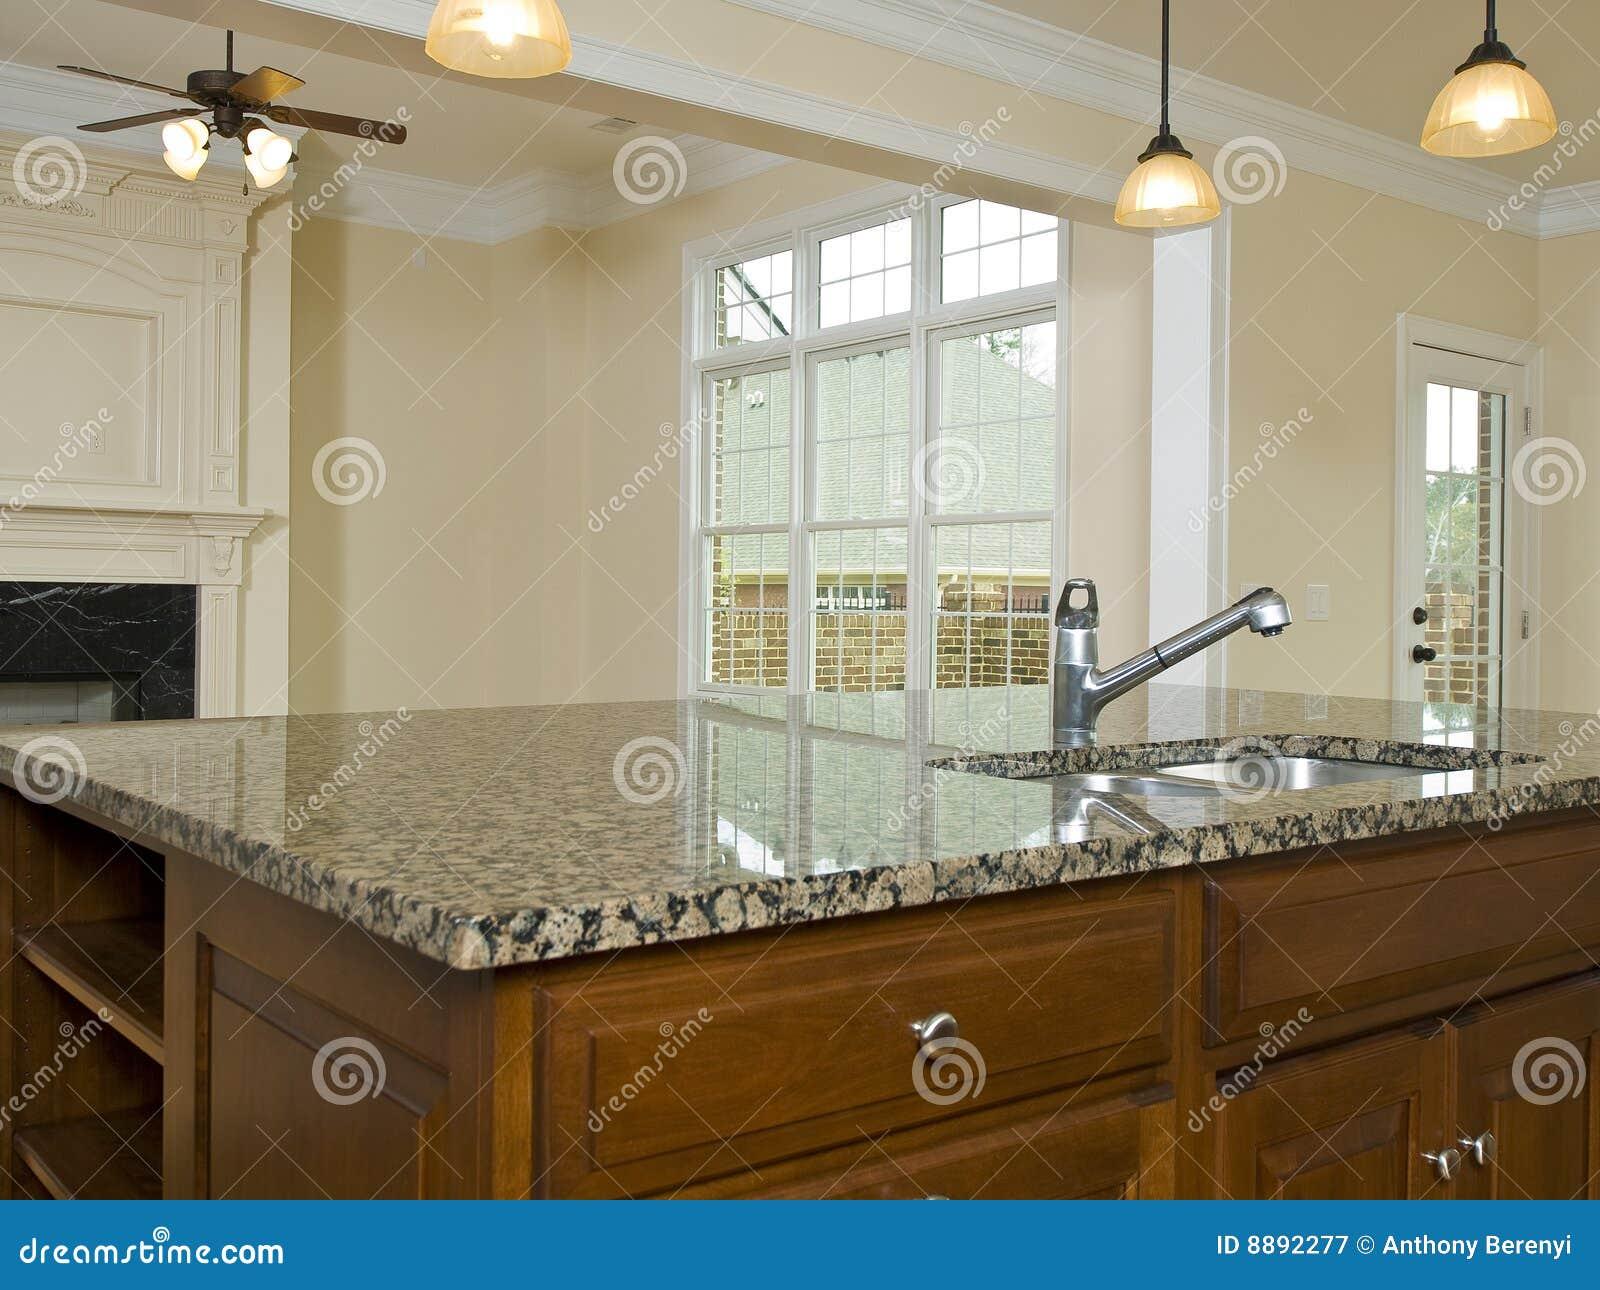 Luxury Home Kitchen Granite Island Countertop Stock Image